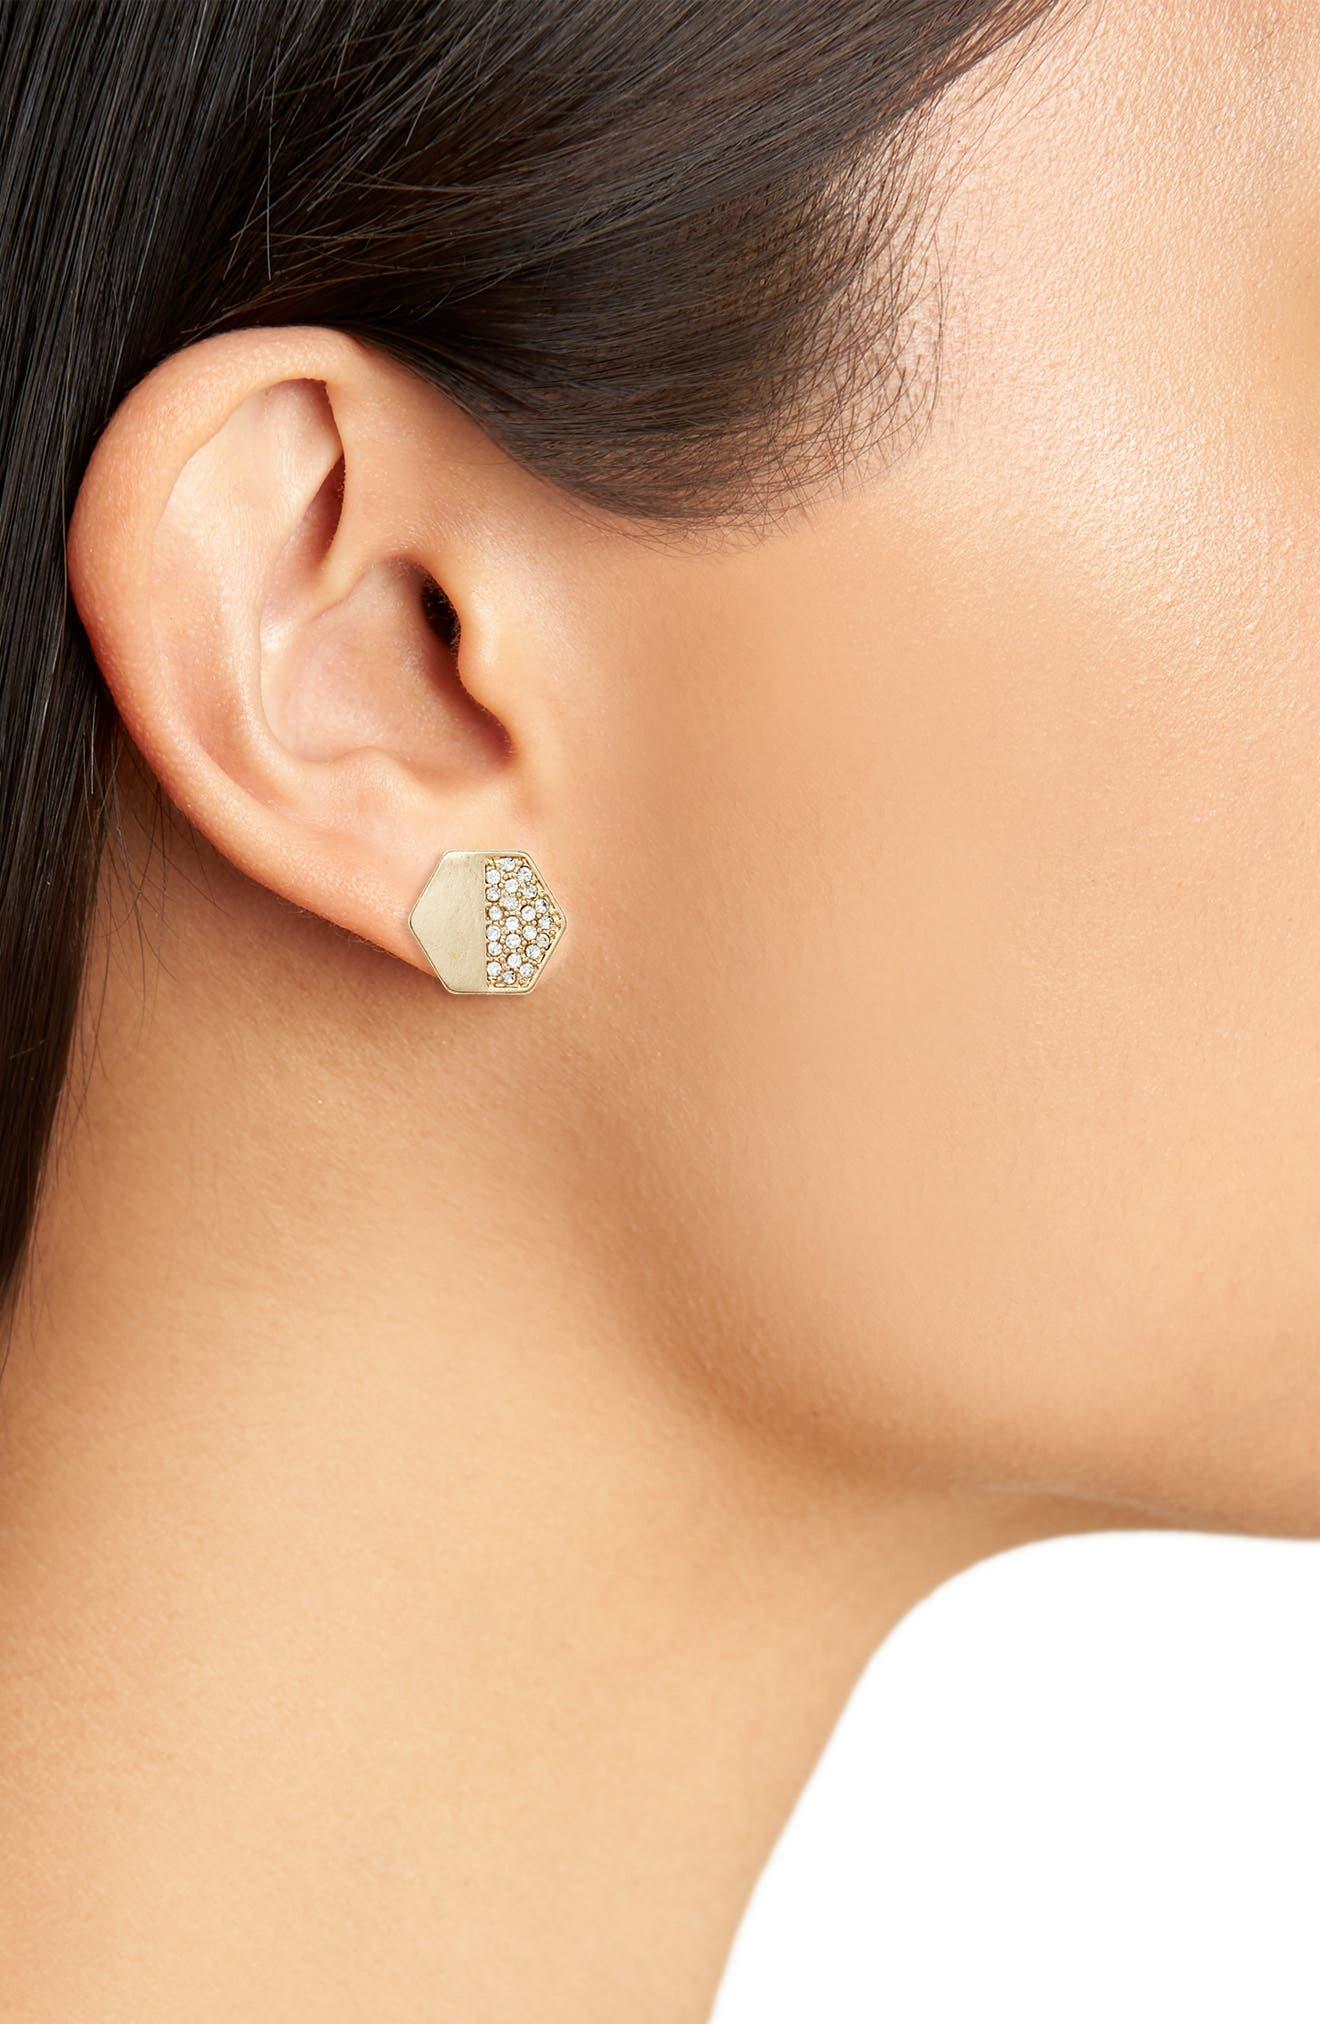 Crystal Hexagon Stud Earrings,                             Alternate thumbnail 2, color,                             710